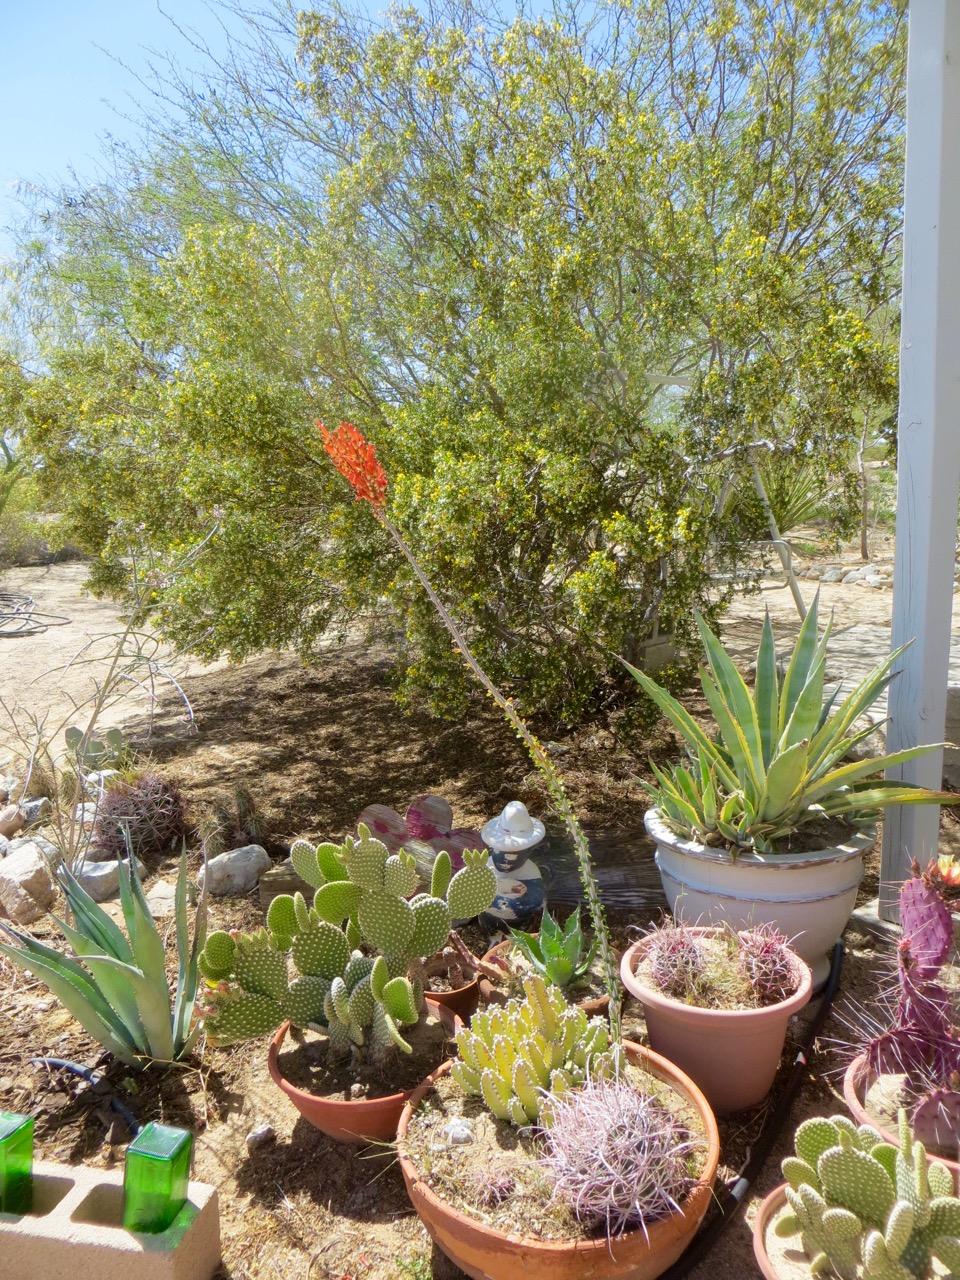 DWLT_18_Carl's_cactus_in_pots_(1).jpg